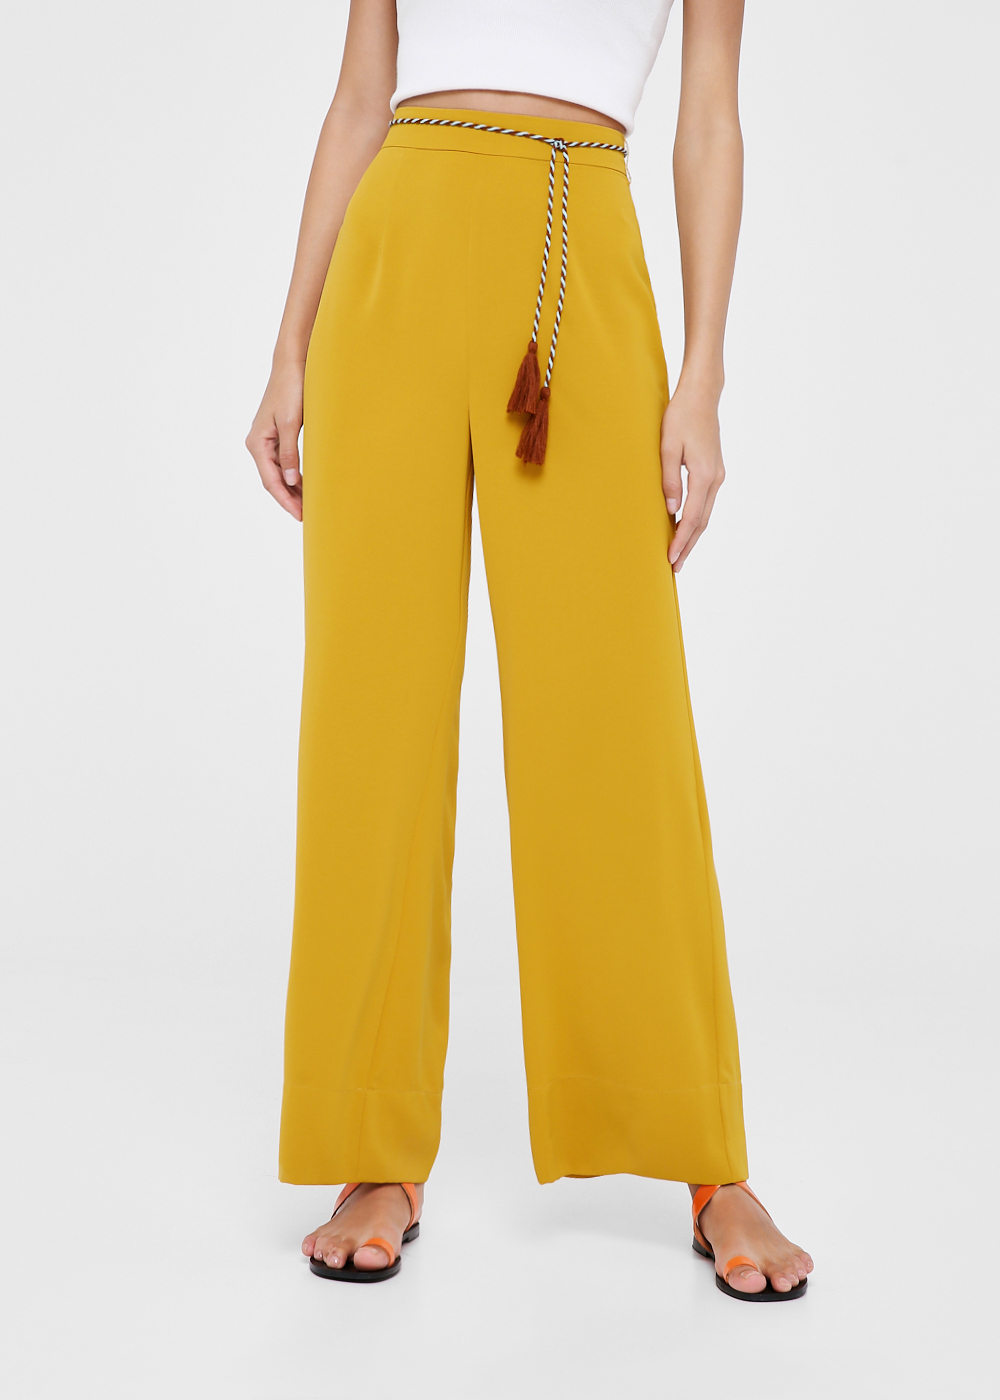 Marley Tassel Tie Straight Leg Pants